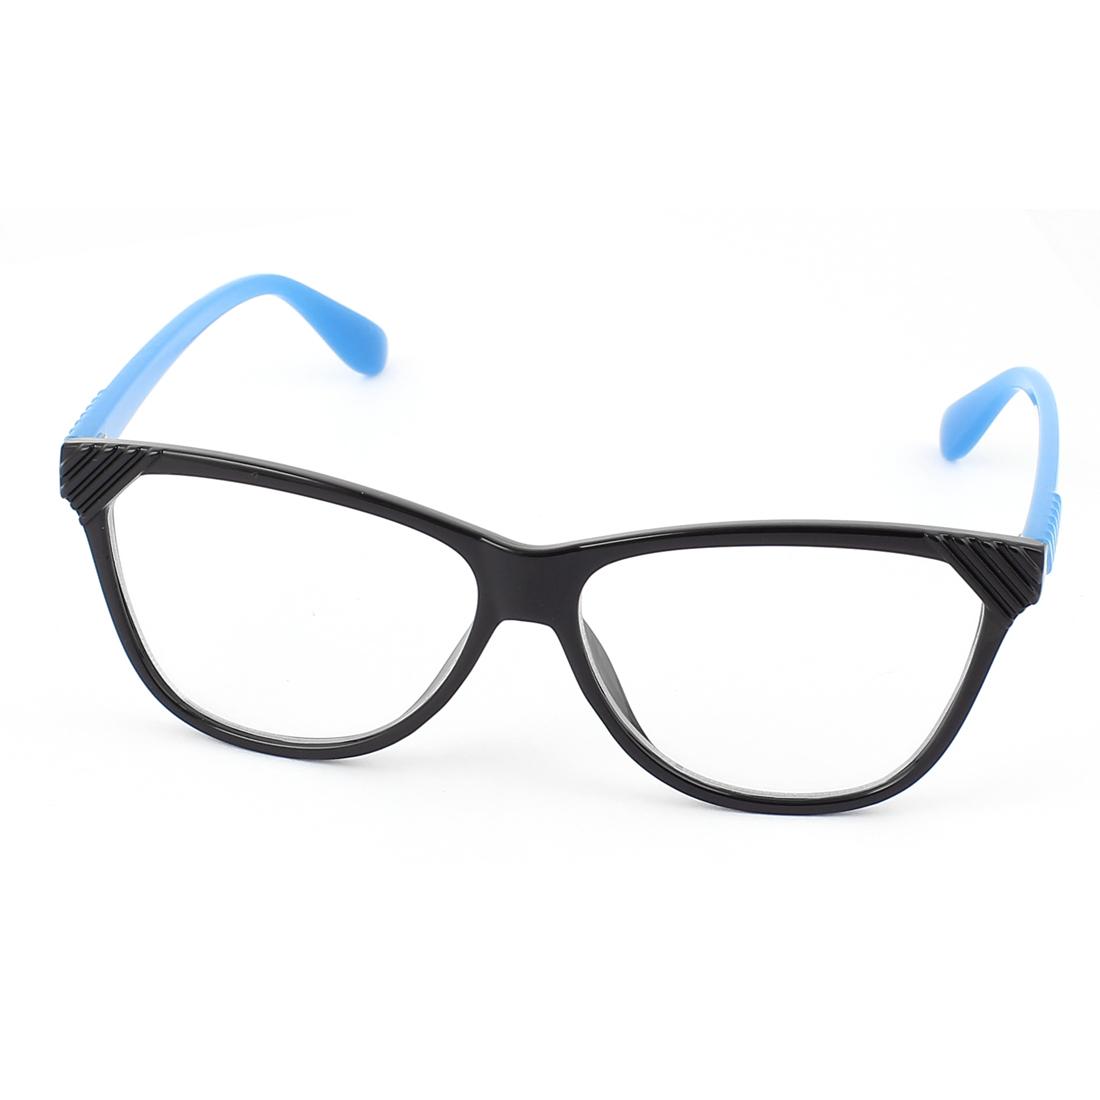 Plastic Arm Single Bridge Clear Lens Plain Glasses Eyeglasses Plano Spectacles Blue